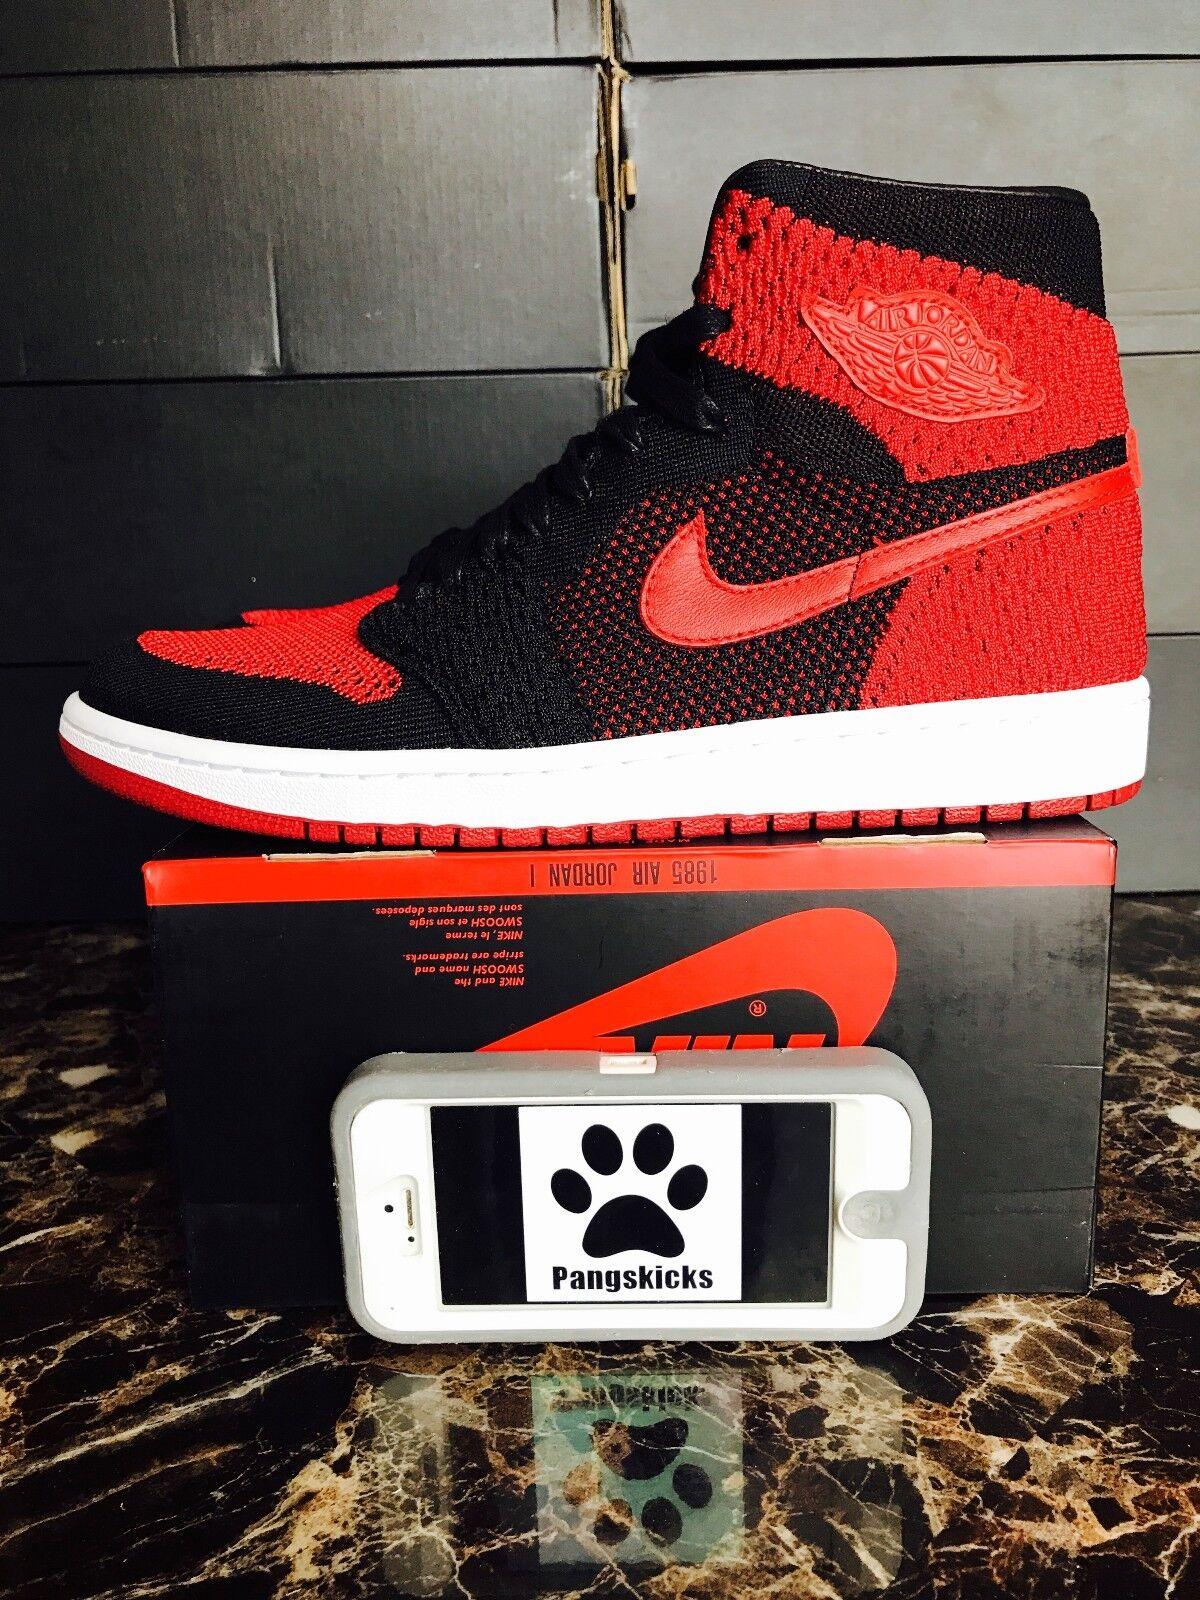 Nike air jordan 1 'alto flyknit vietato allevati rosso 919704-001 numero 14